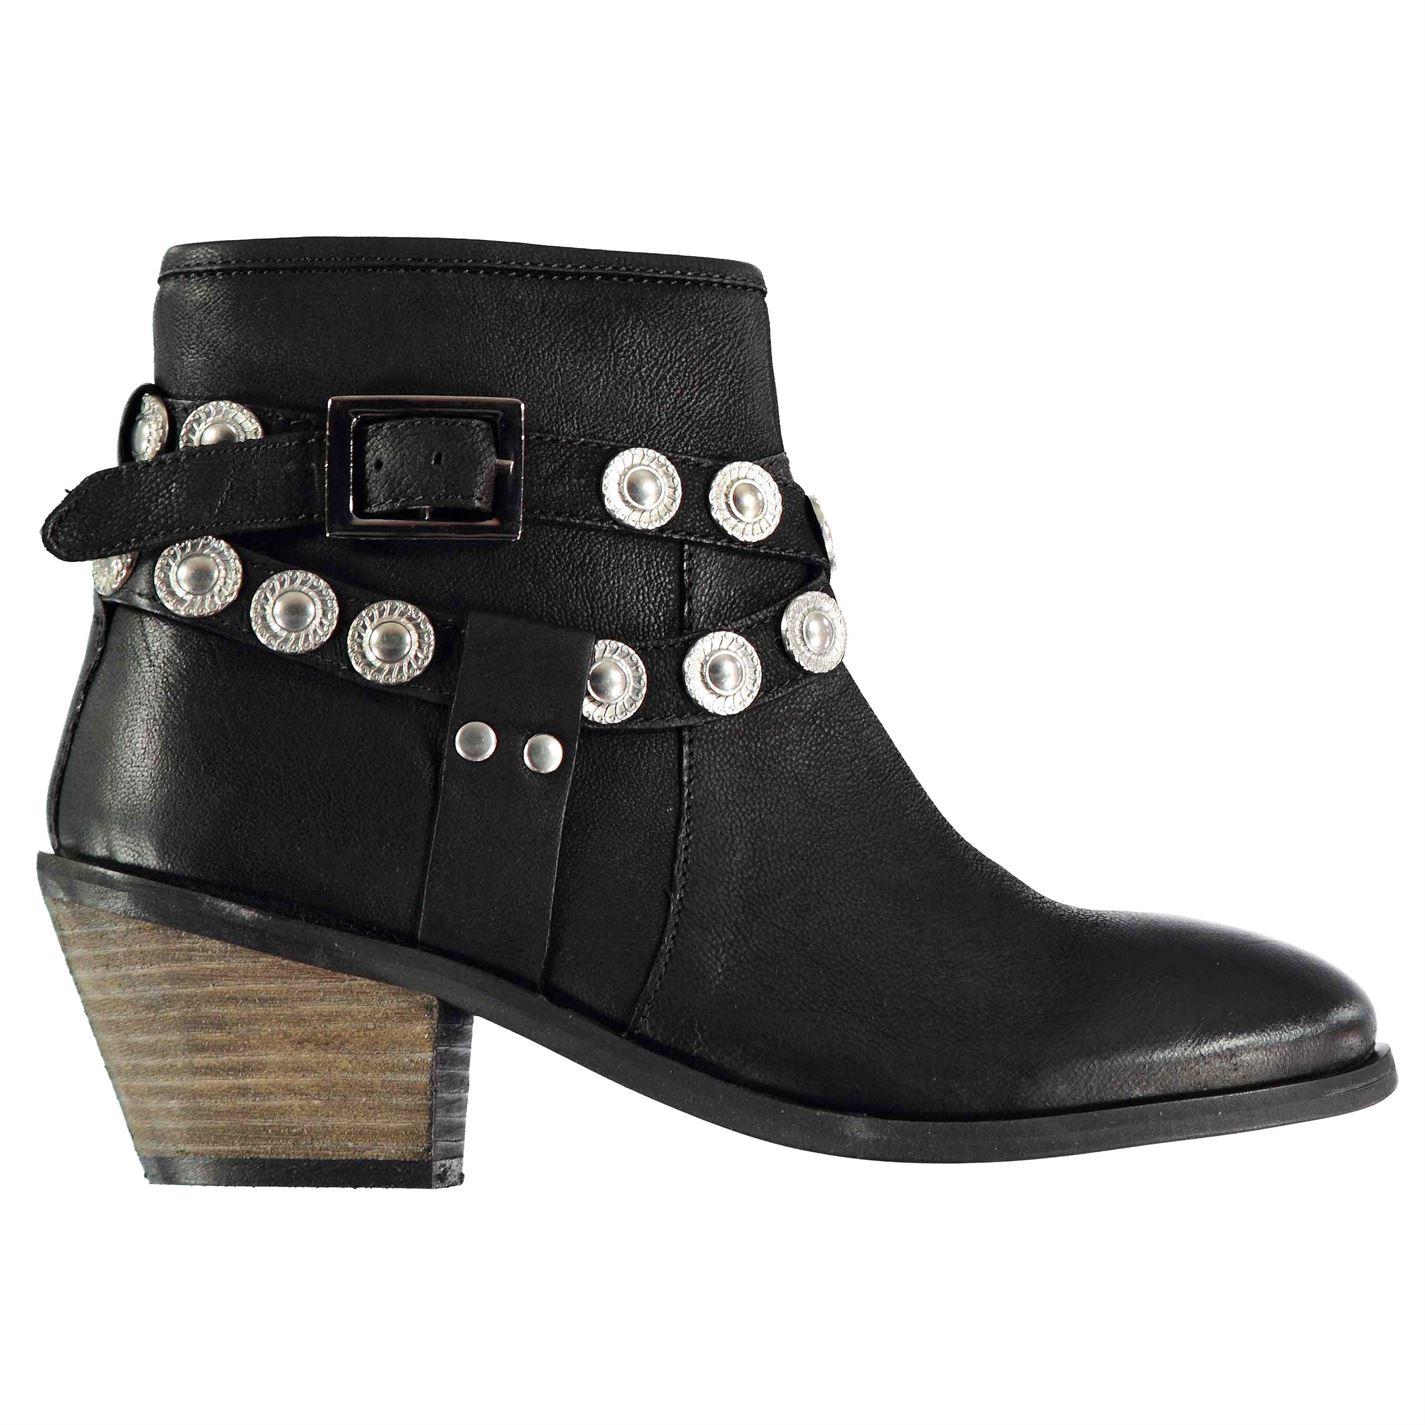 Firetrap Stud Boots Ladies